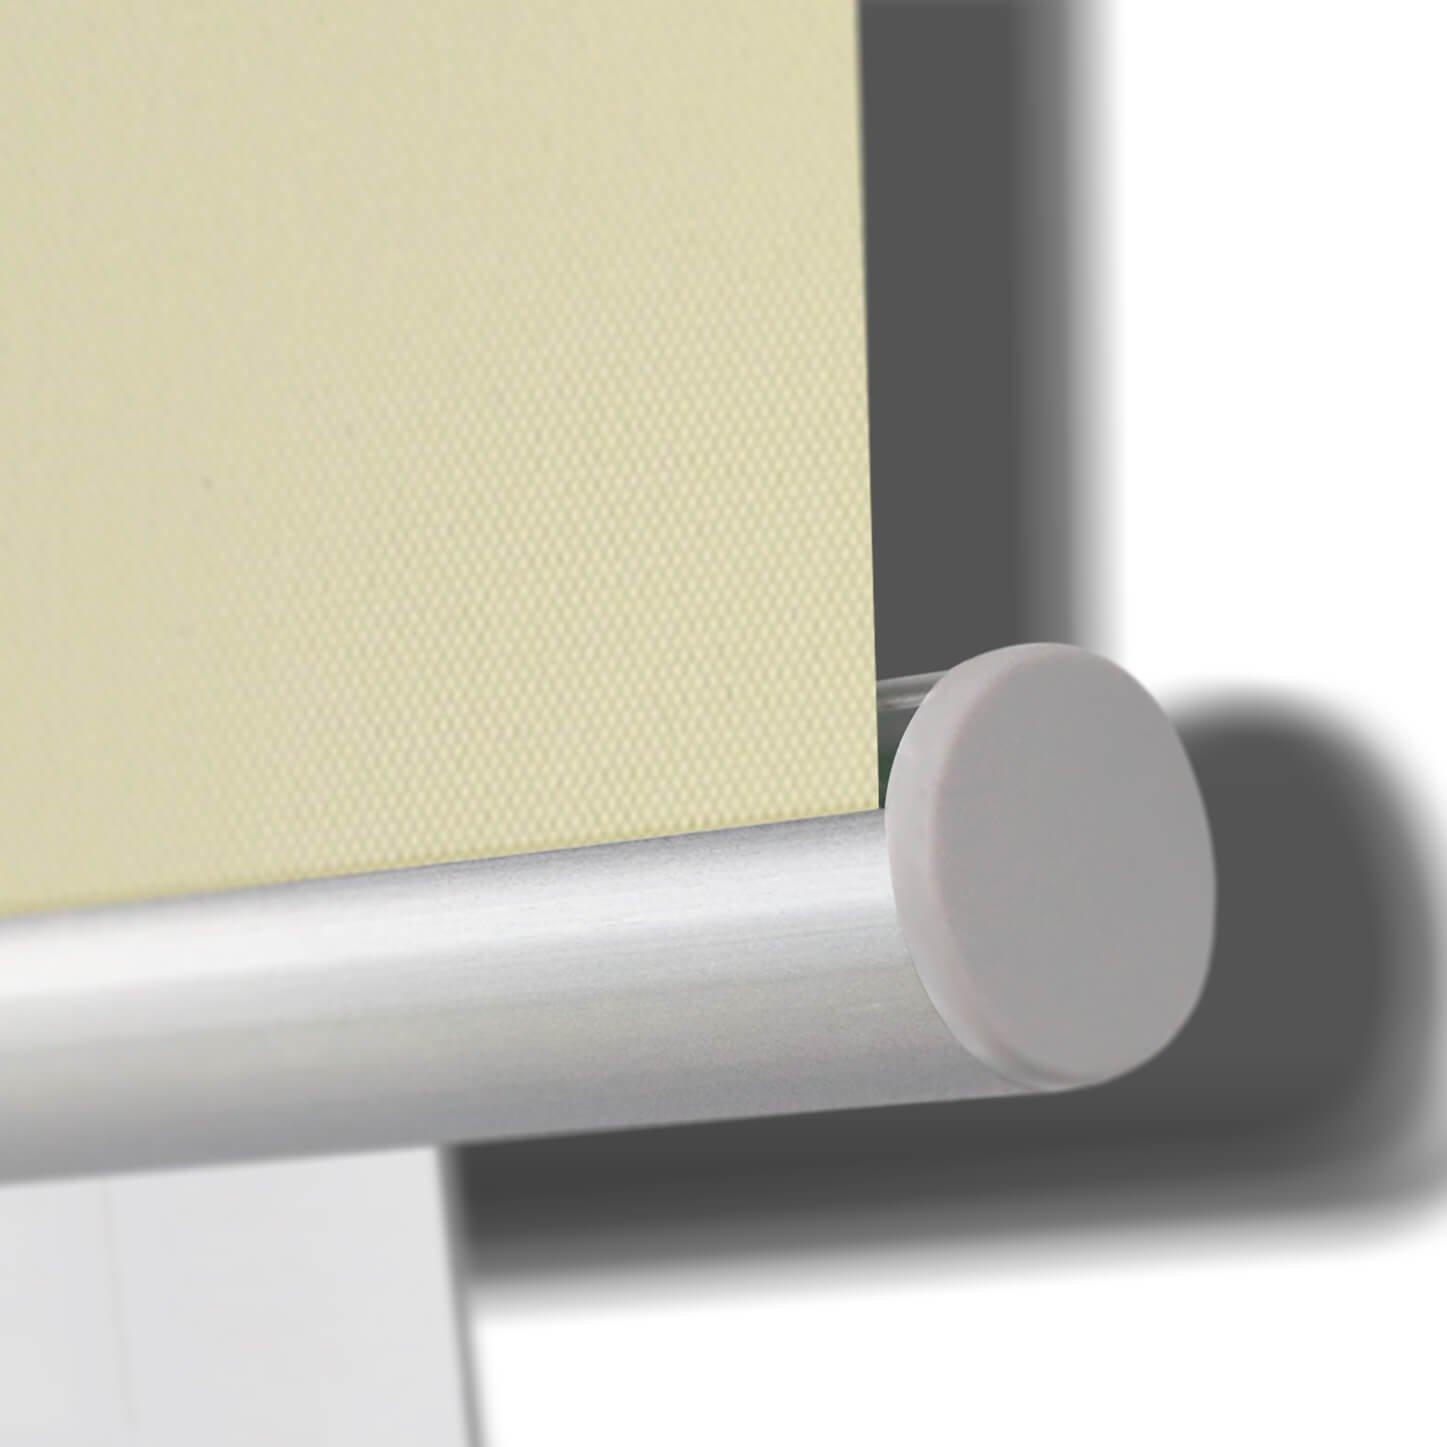 Fensterdecor Fertig Fertig Fertig Verdunkelungsrollo Blau 180 x 180 cm (BxH) B00BW1K82G Seitenzug- & Springrollos ccf34f